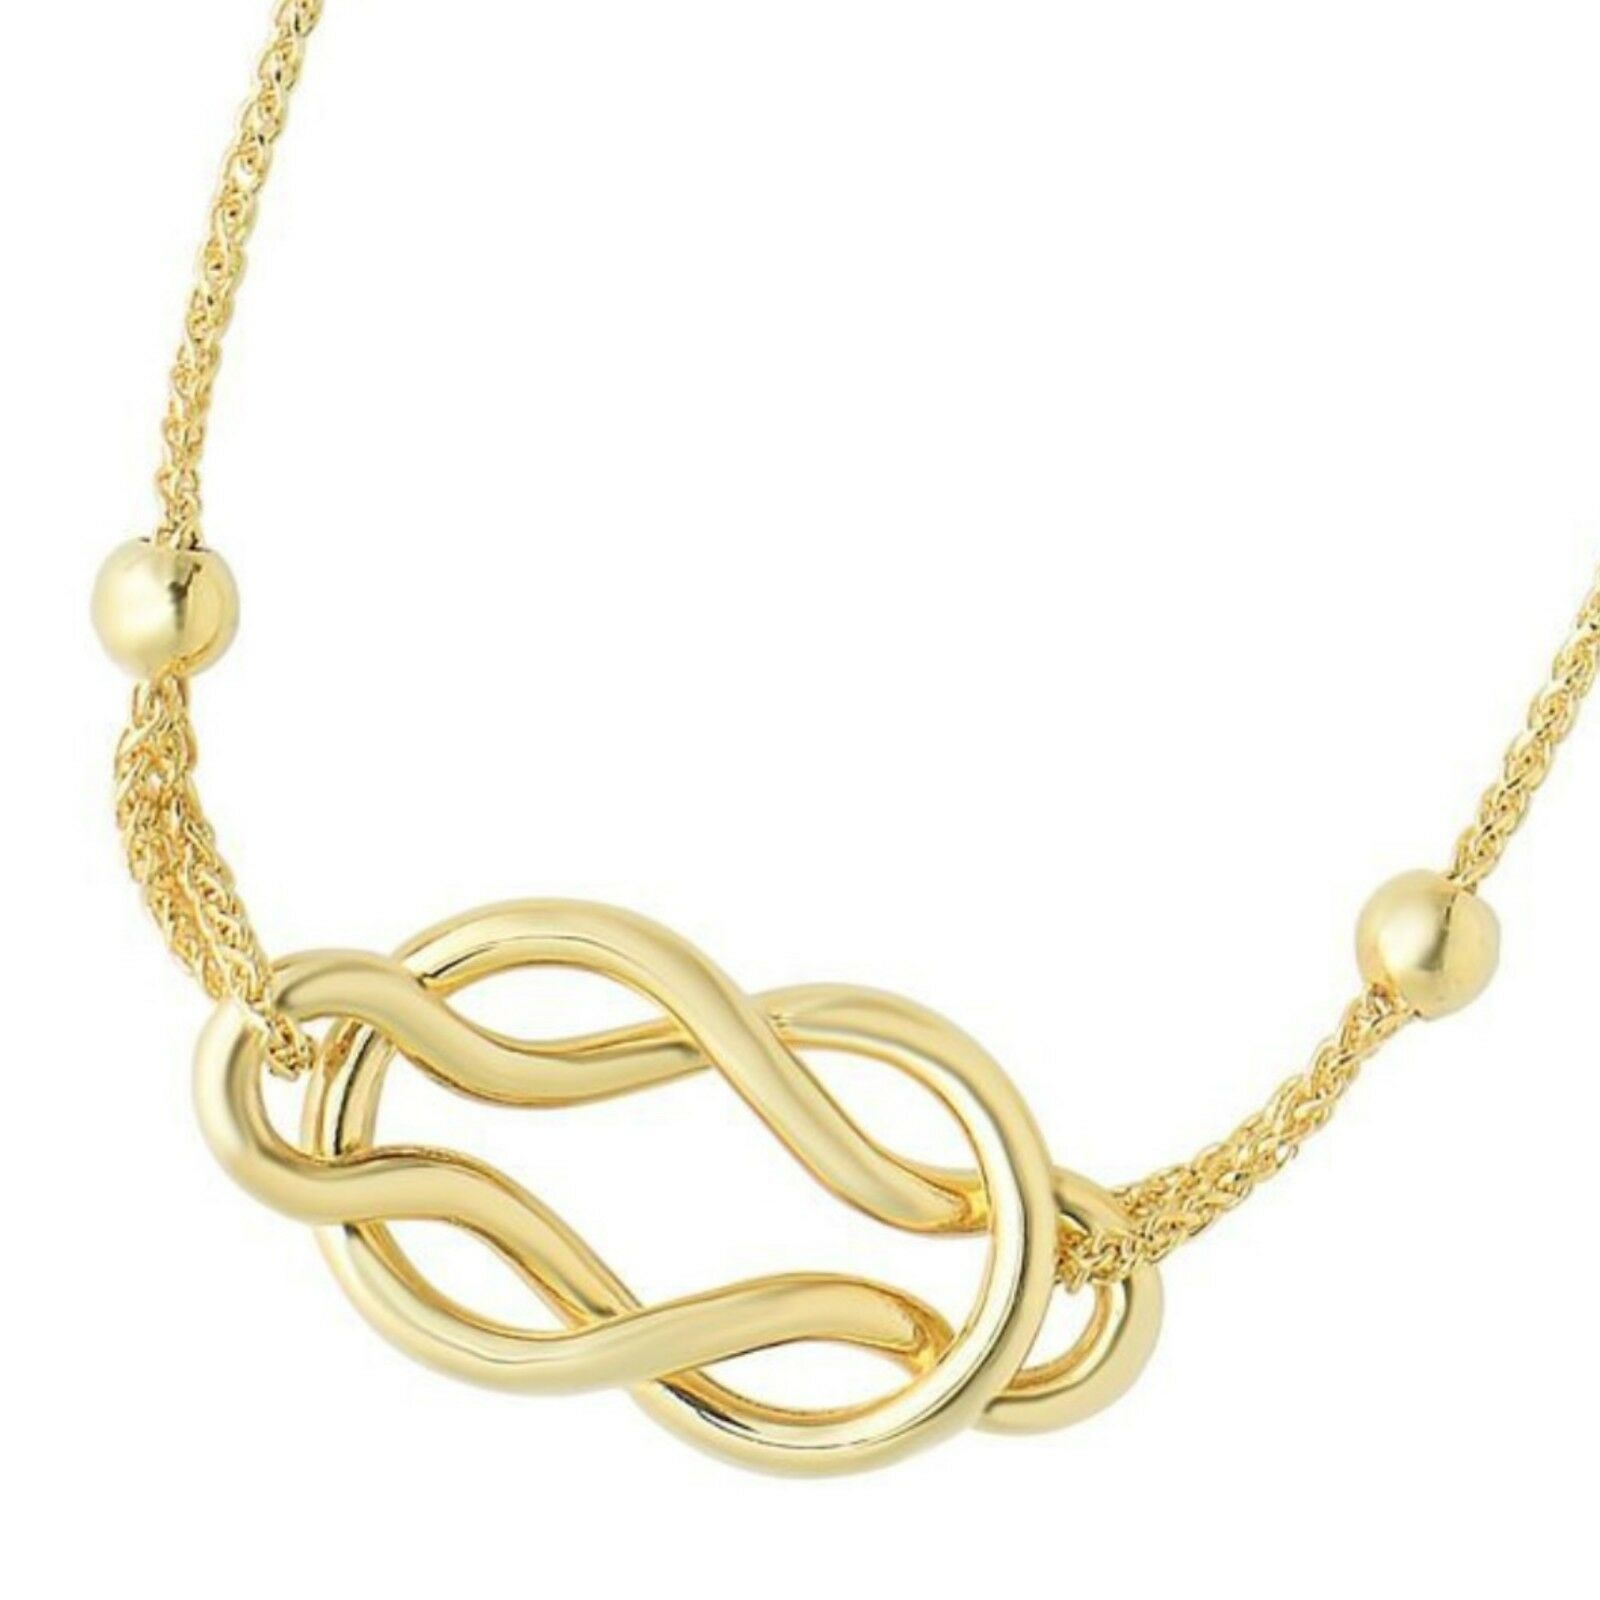 14kt 9.25  Yellow gold Diamond Cut Round Wheat Bracelet with Shiny Celtic Knot